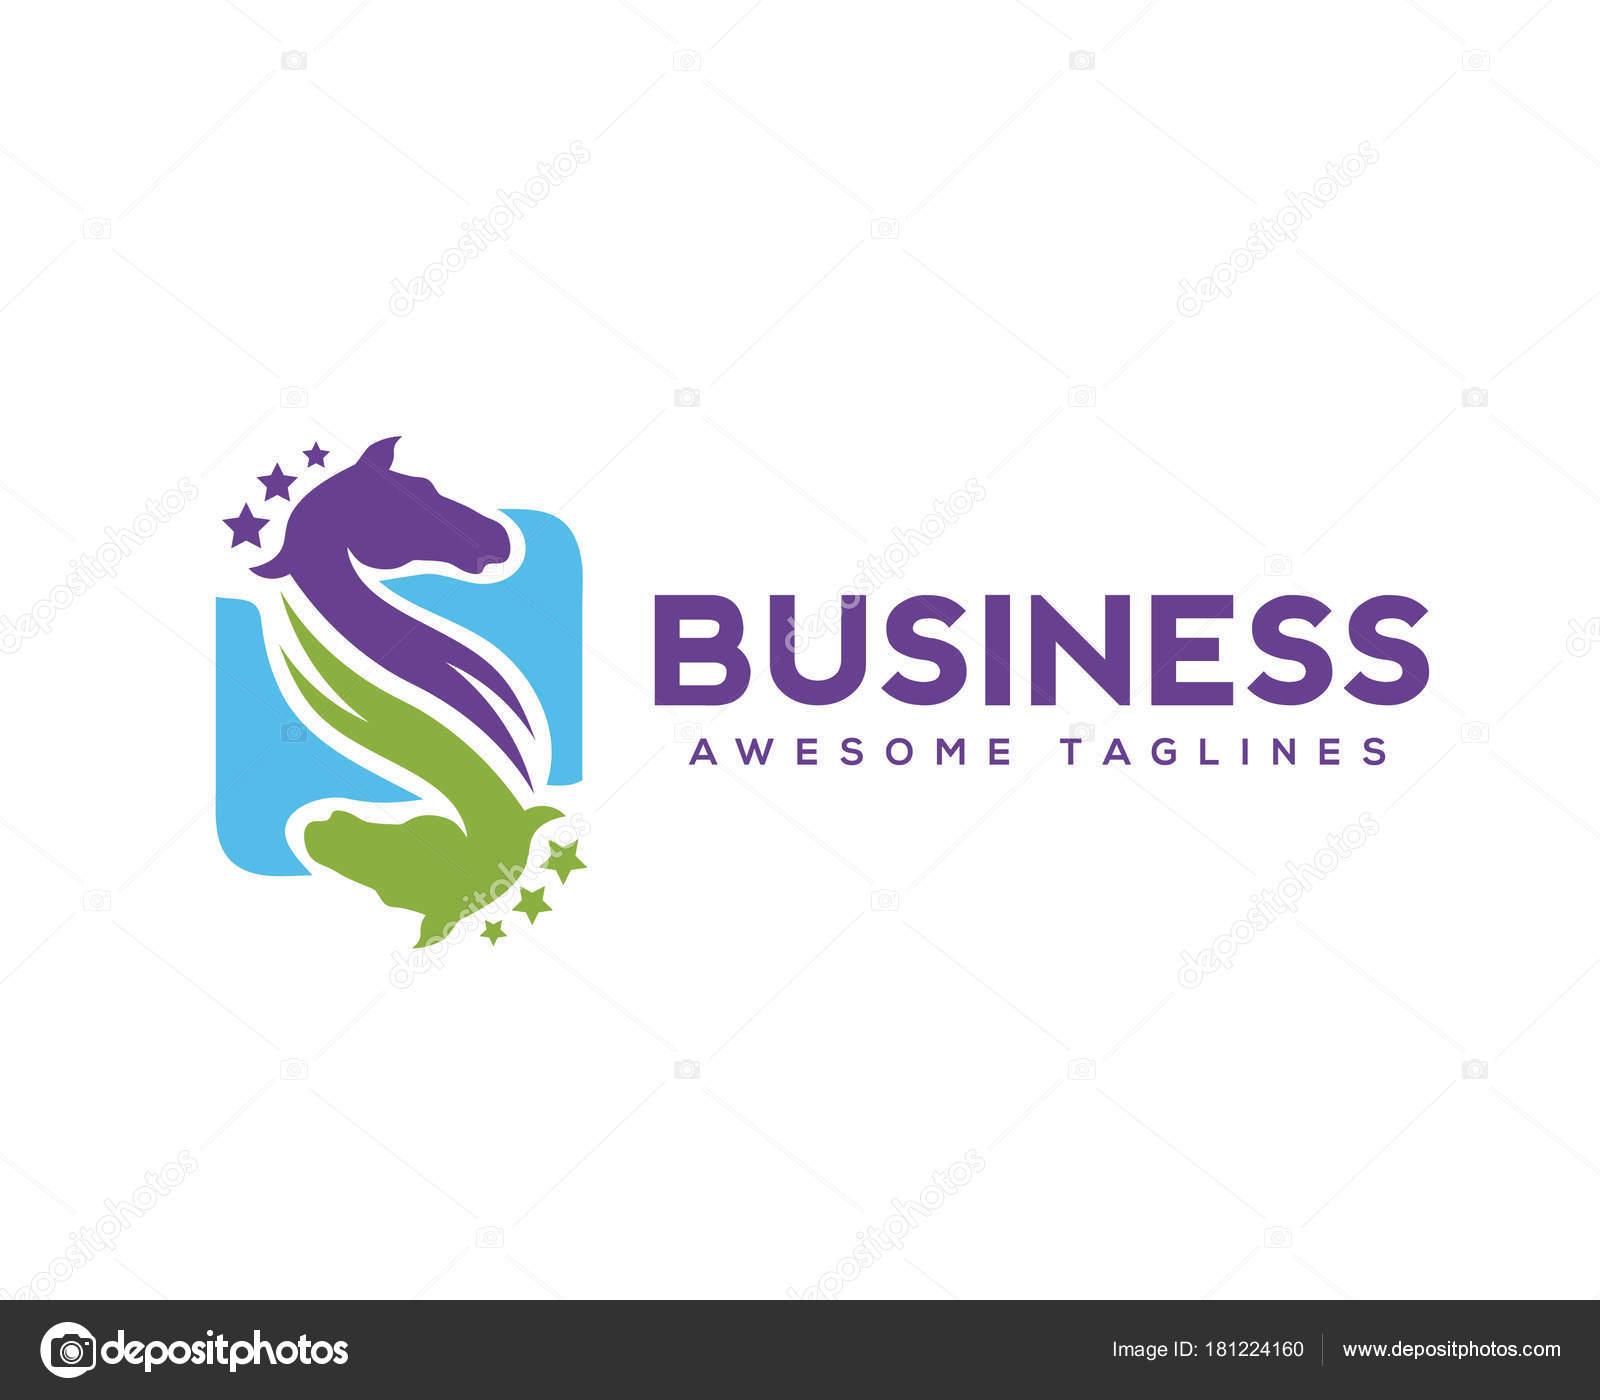 Two Horses Logo Letter Form Two Horses Letter Horse Head Logo Emblem Playful Stock Vector C Krustovin 181224160